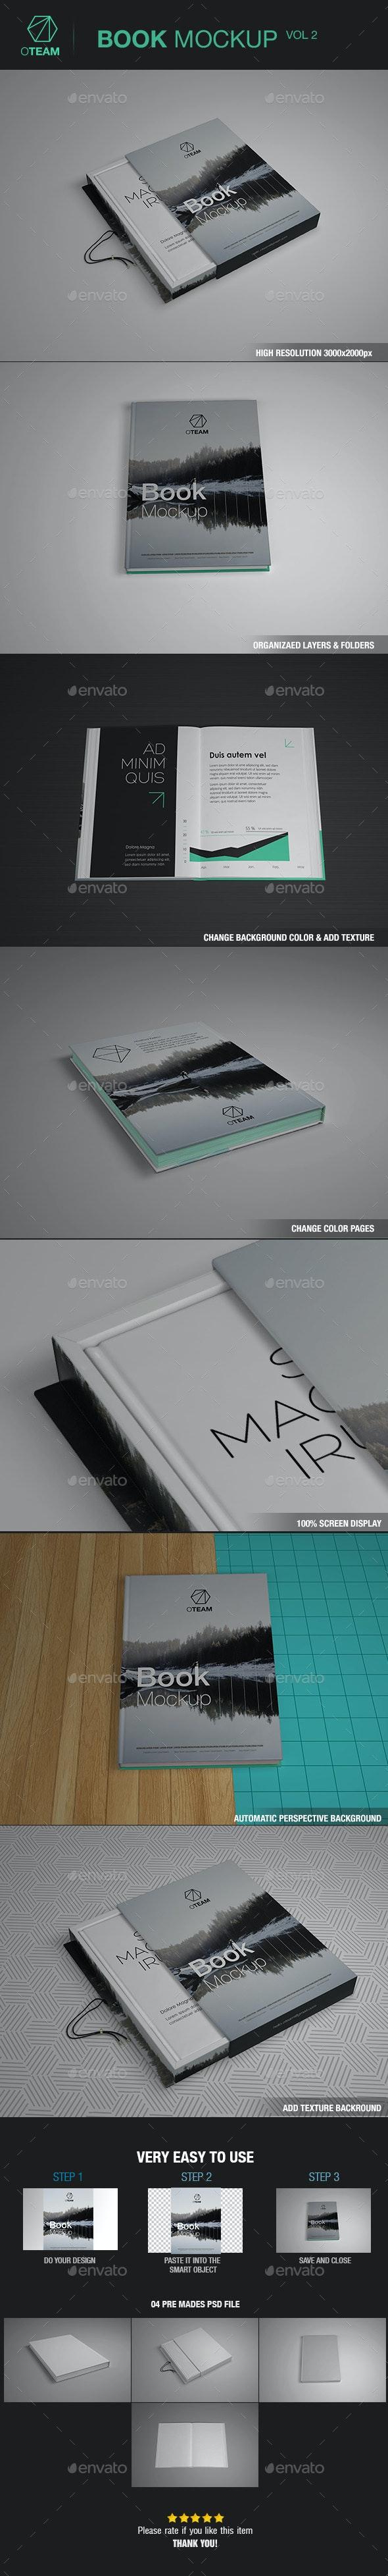 Books Mockup vol.02 - Product Mock-Ups Graphics